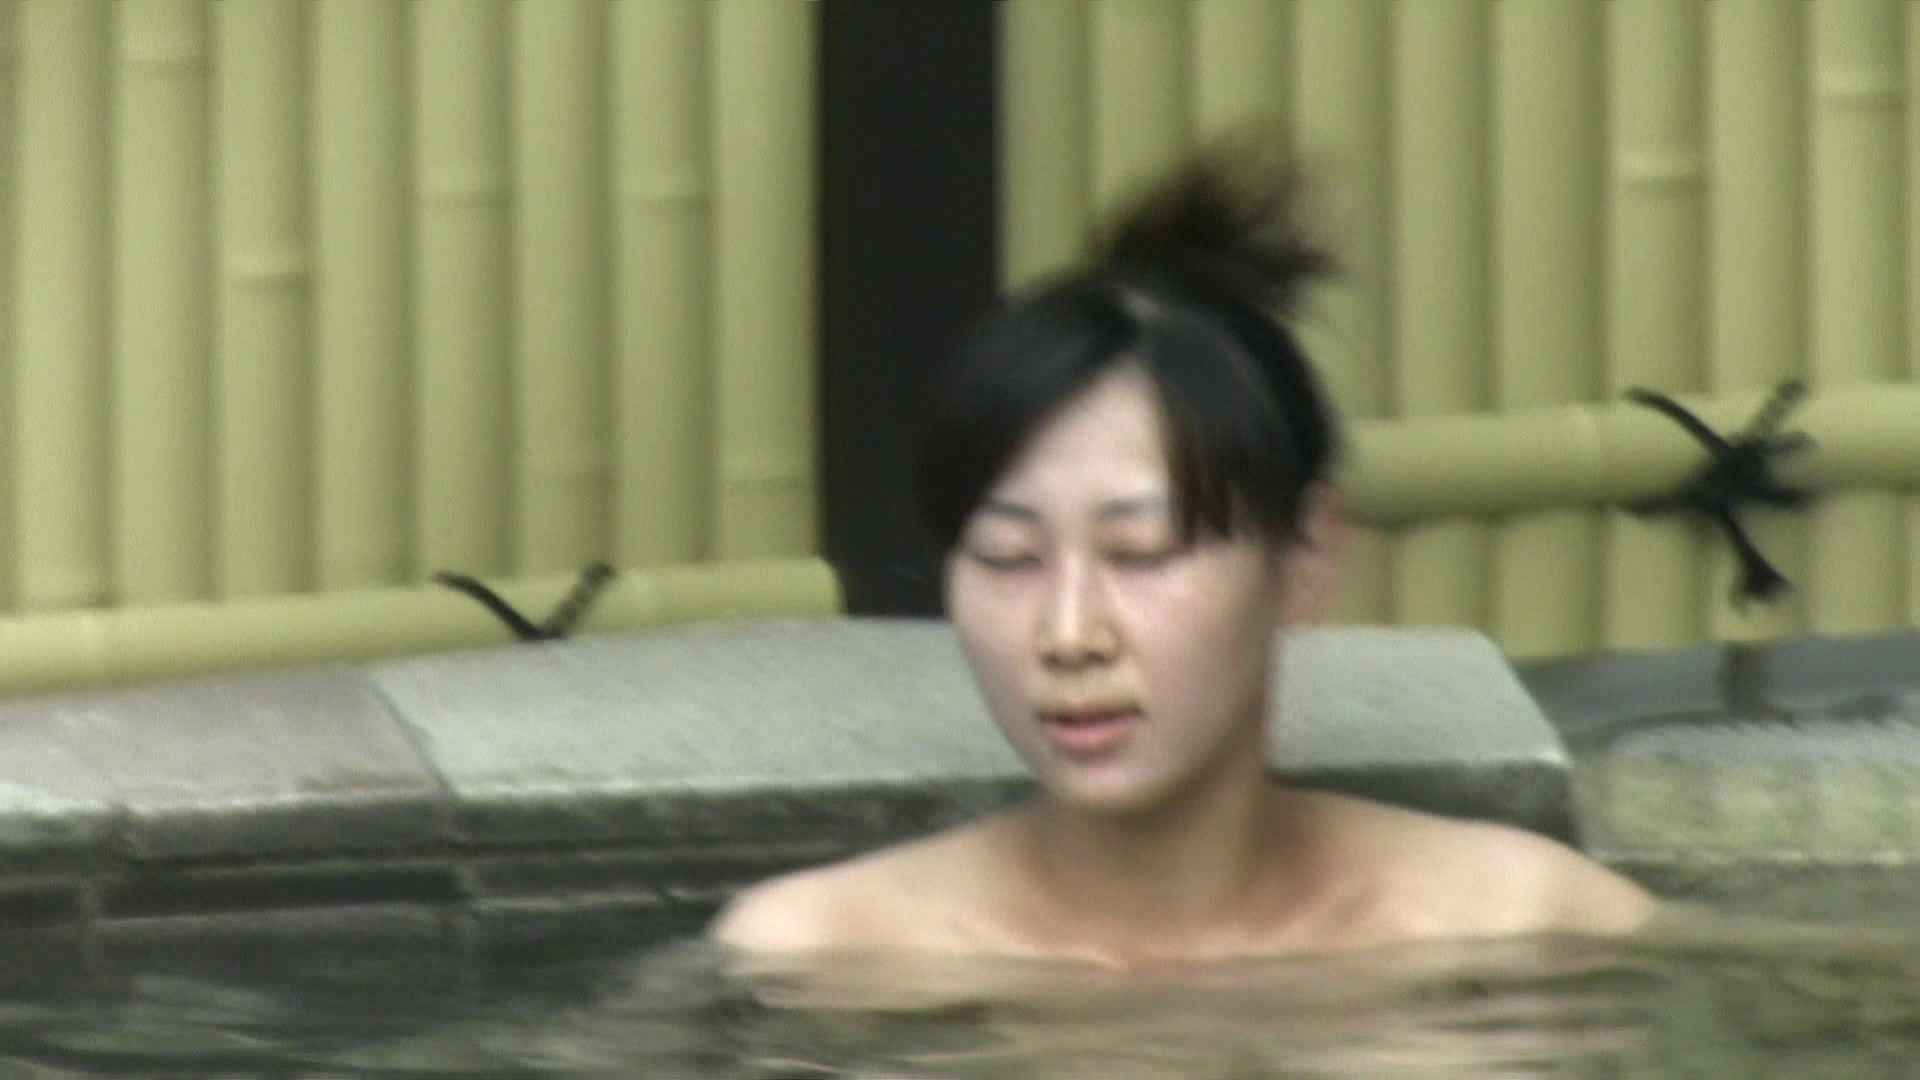 Aquaな露天風呂Vol.665 HなOL   盗撮  104pic 54